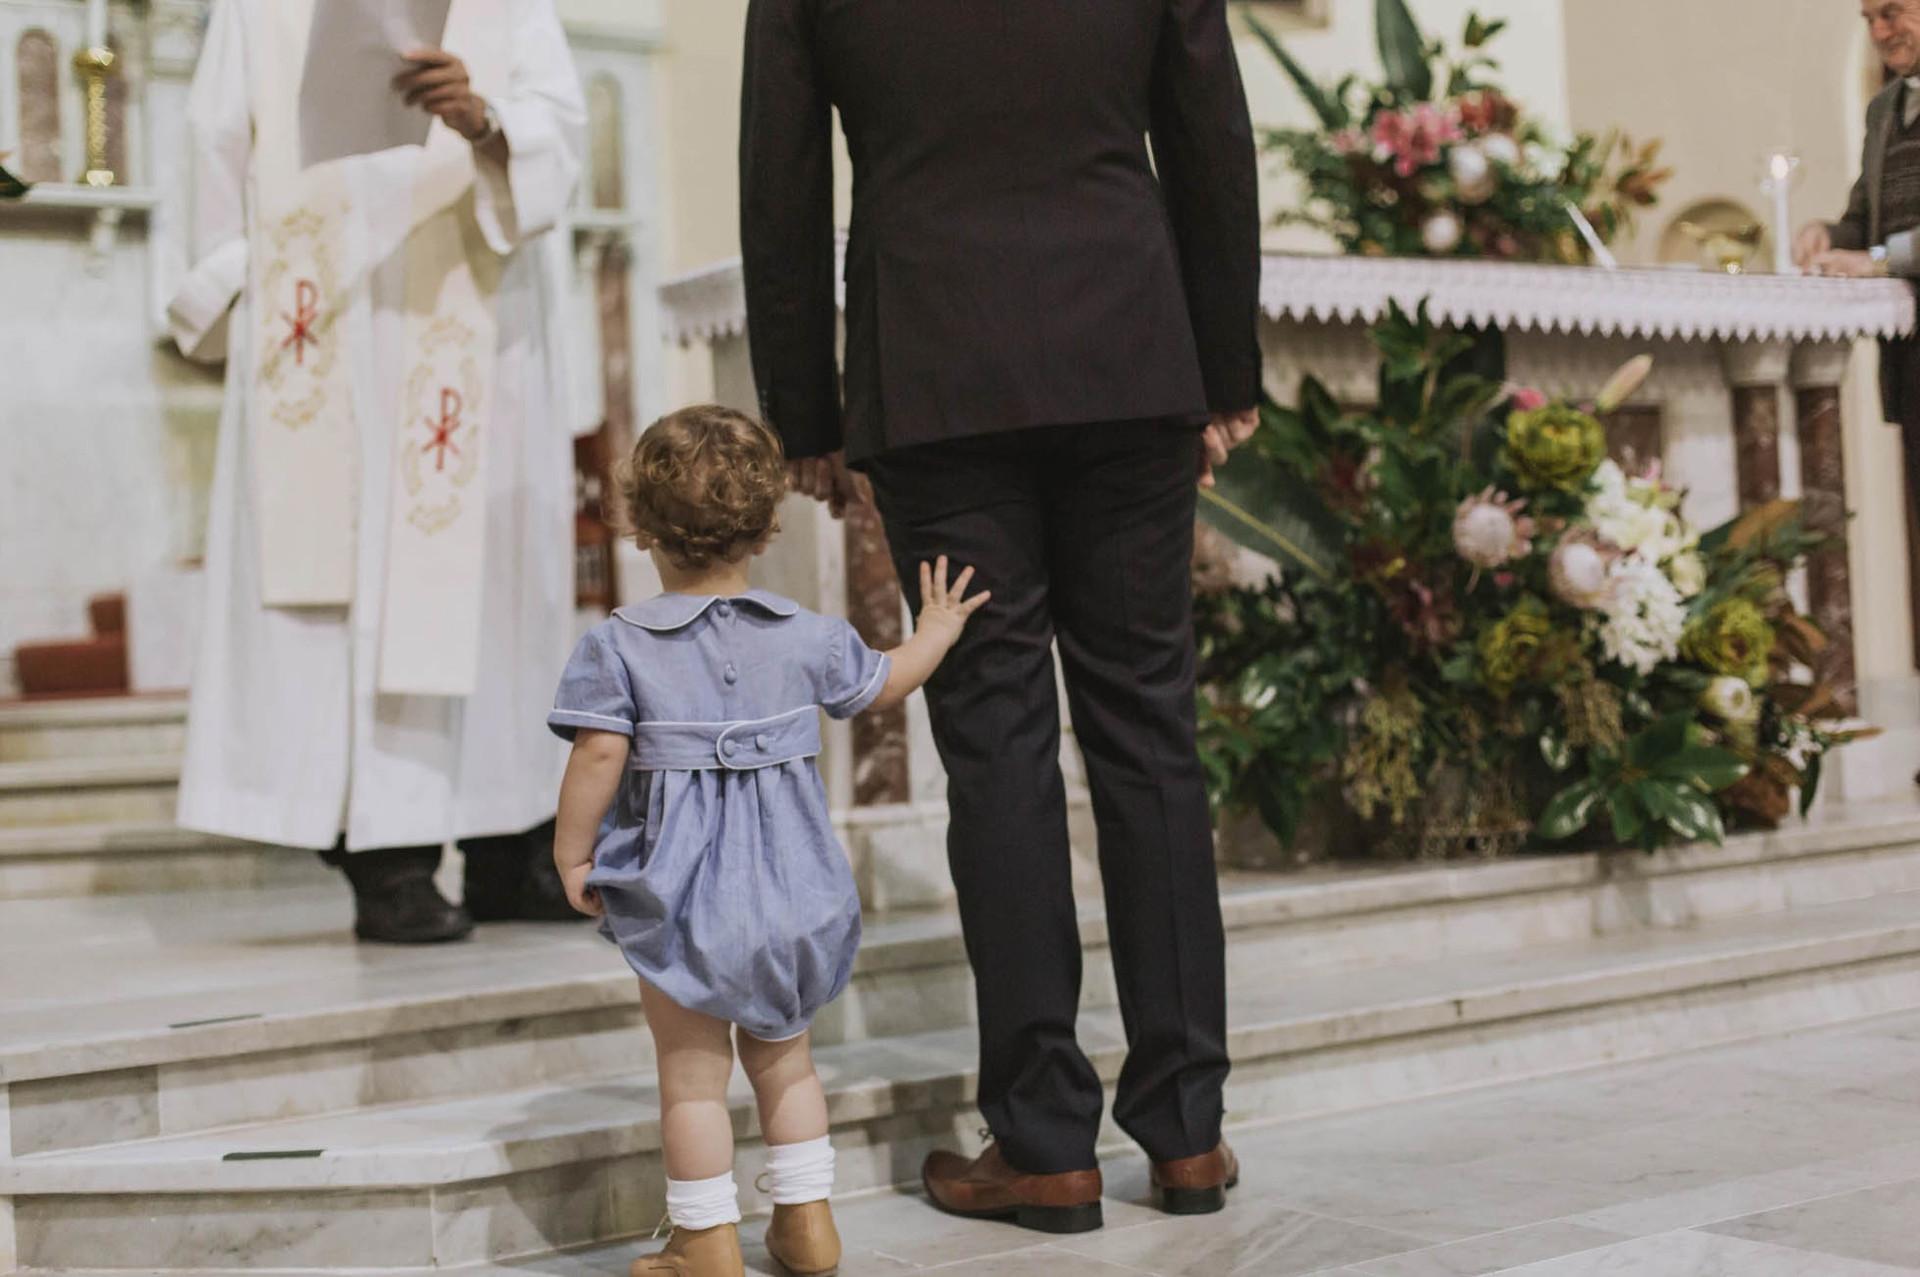 Perth Church Wedding Photographer